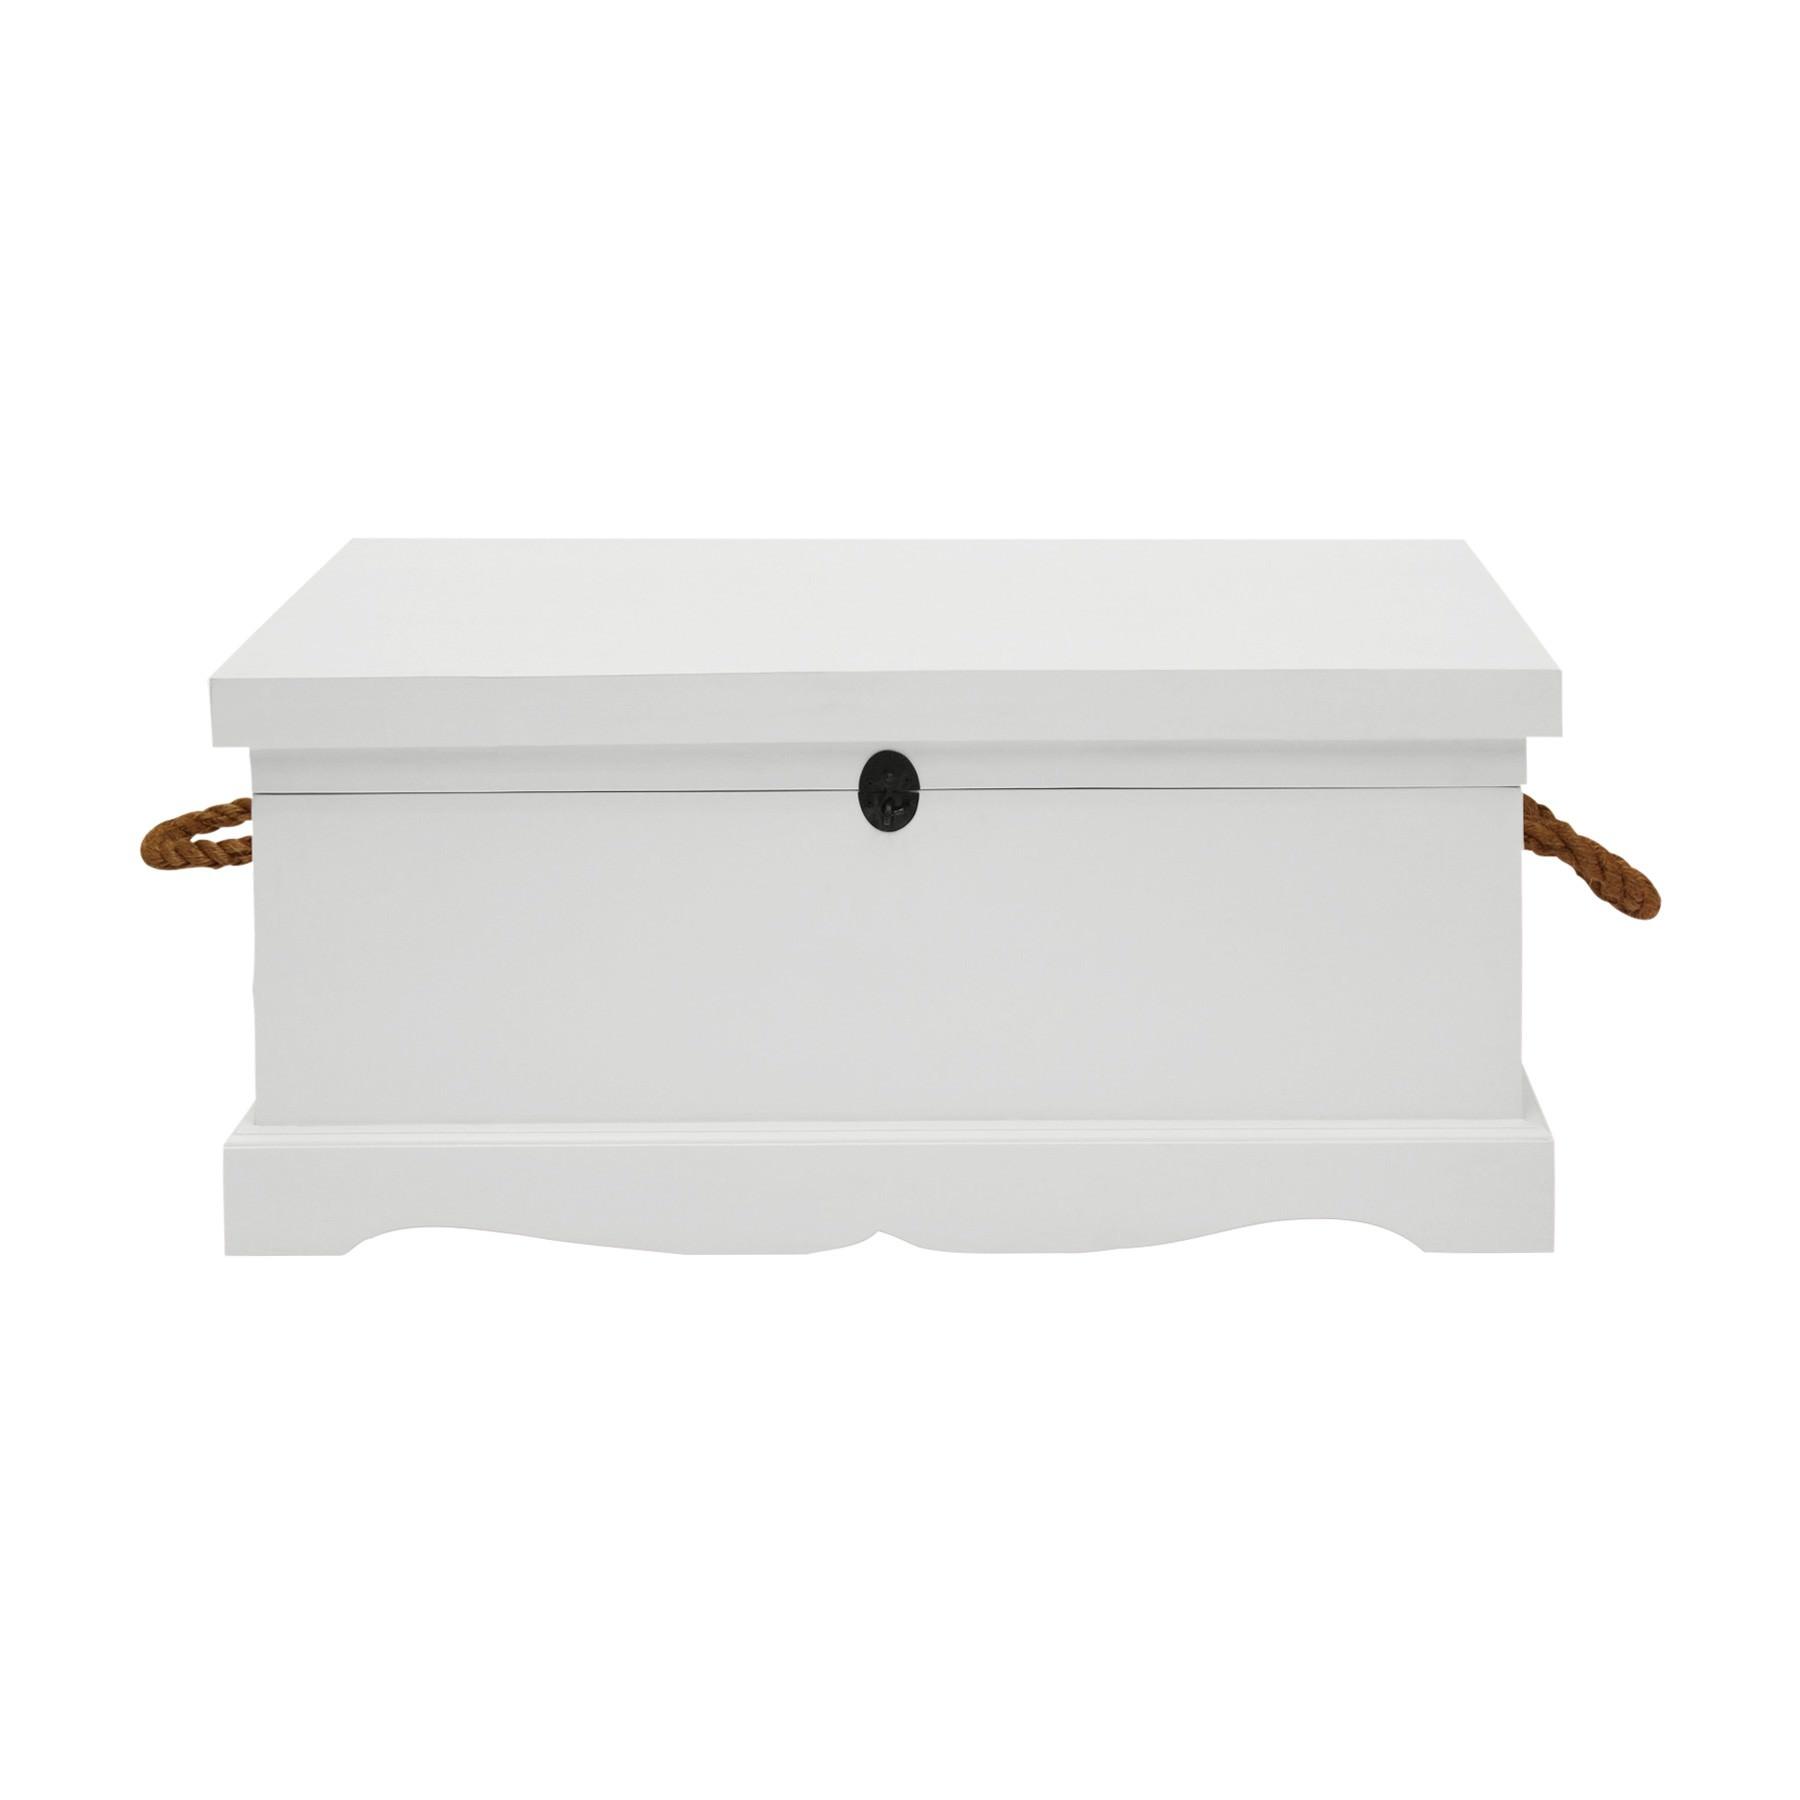 Larajasse Medium Hand Crafted Mahogany Blanket Box, White